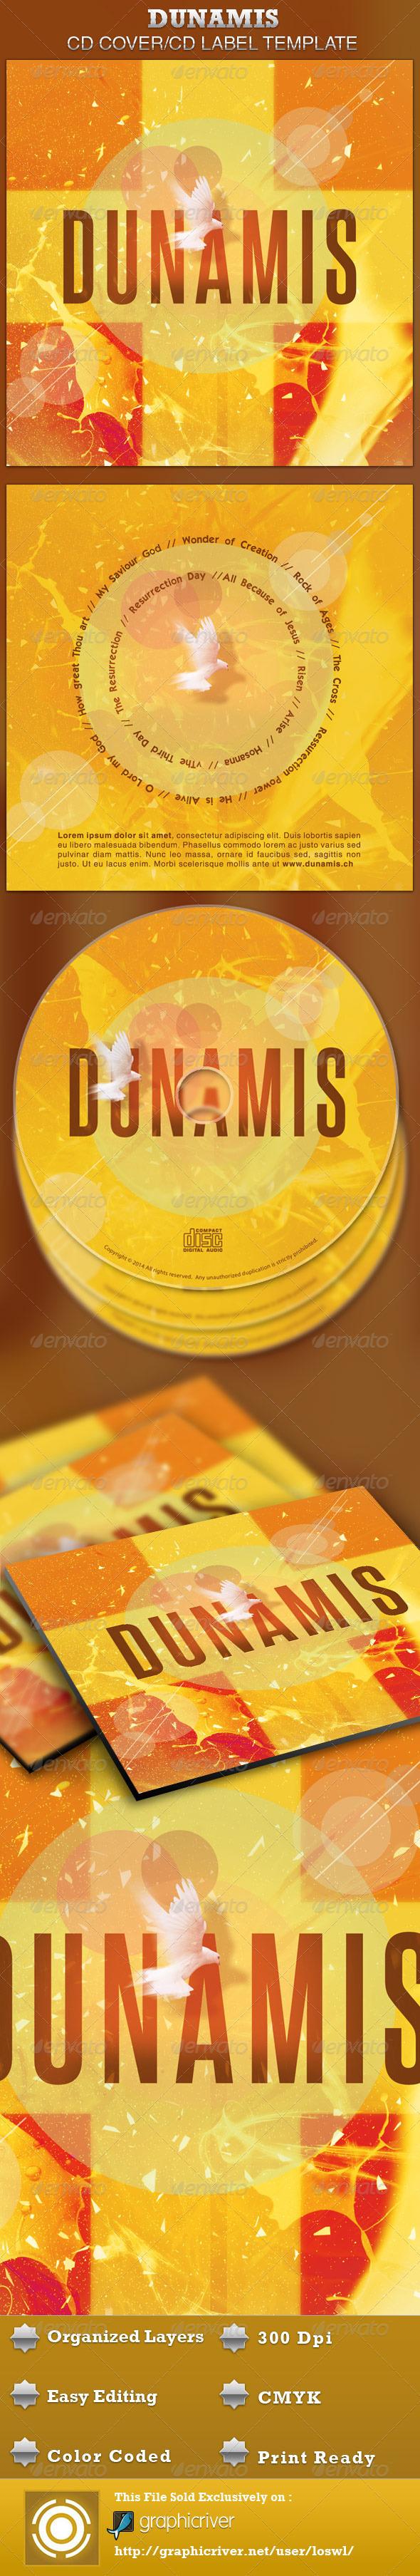 Dunamis CD Artwork Template - CD & DVD Artwork Print Templates